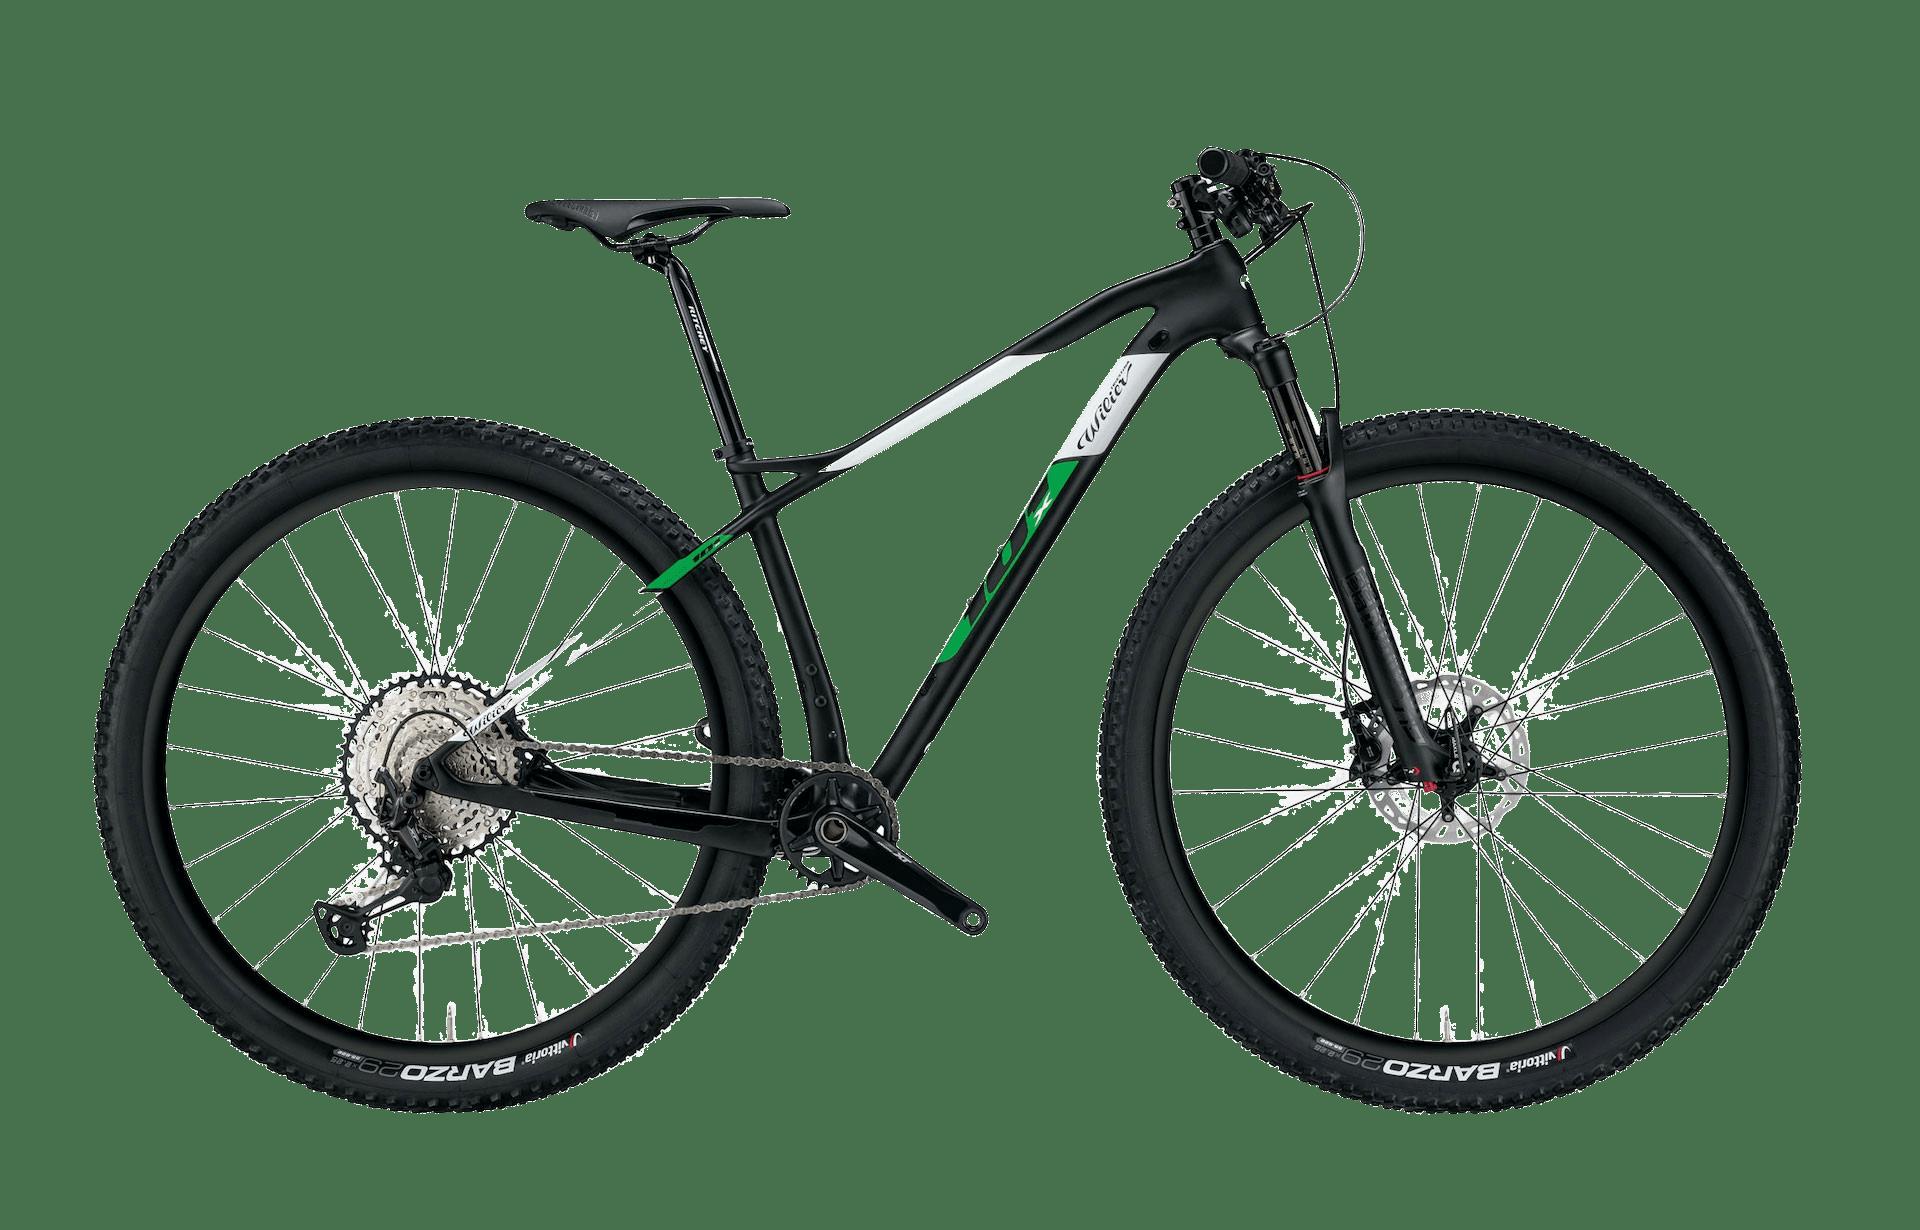 wilier 101x mountainbike